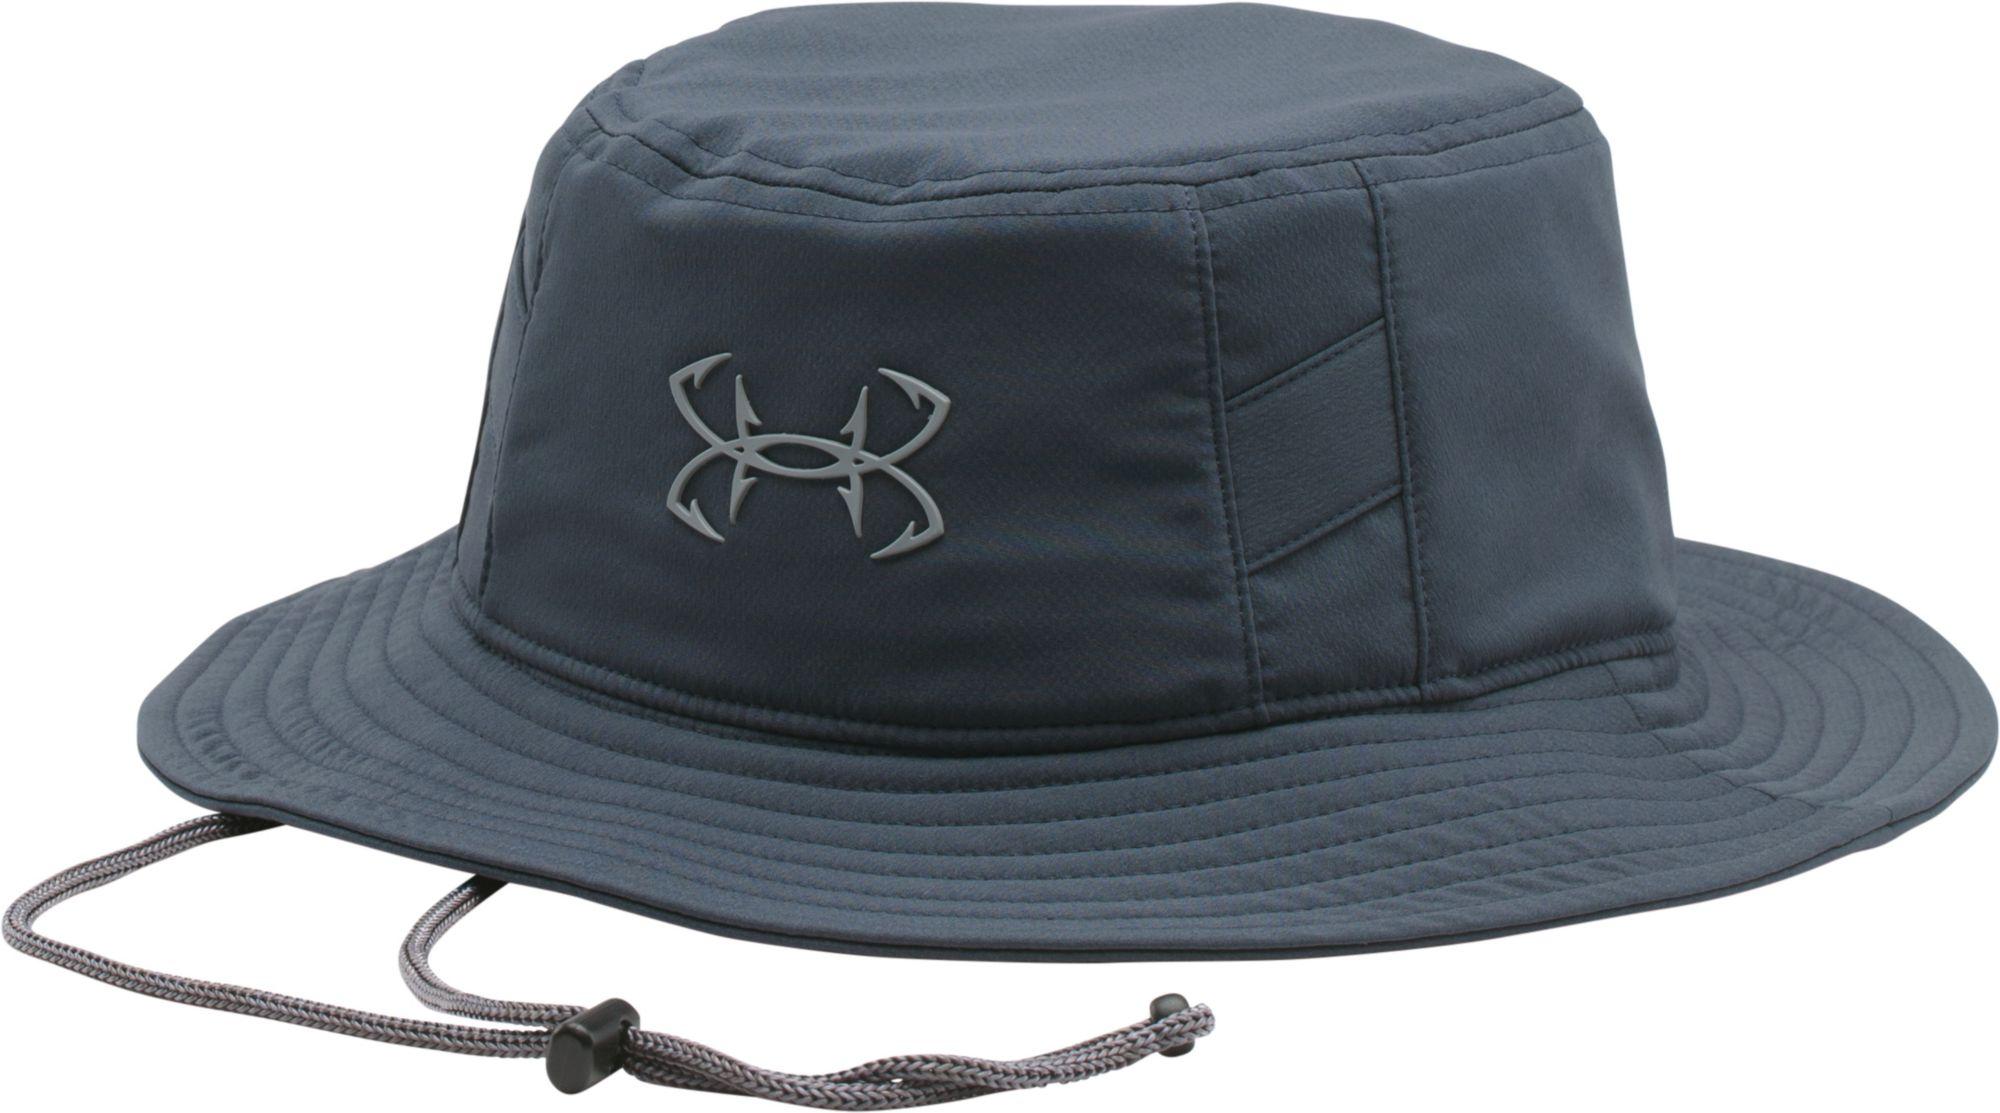 Tren topi bucket hat indonesia for Fish hook for hat